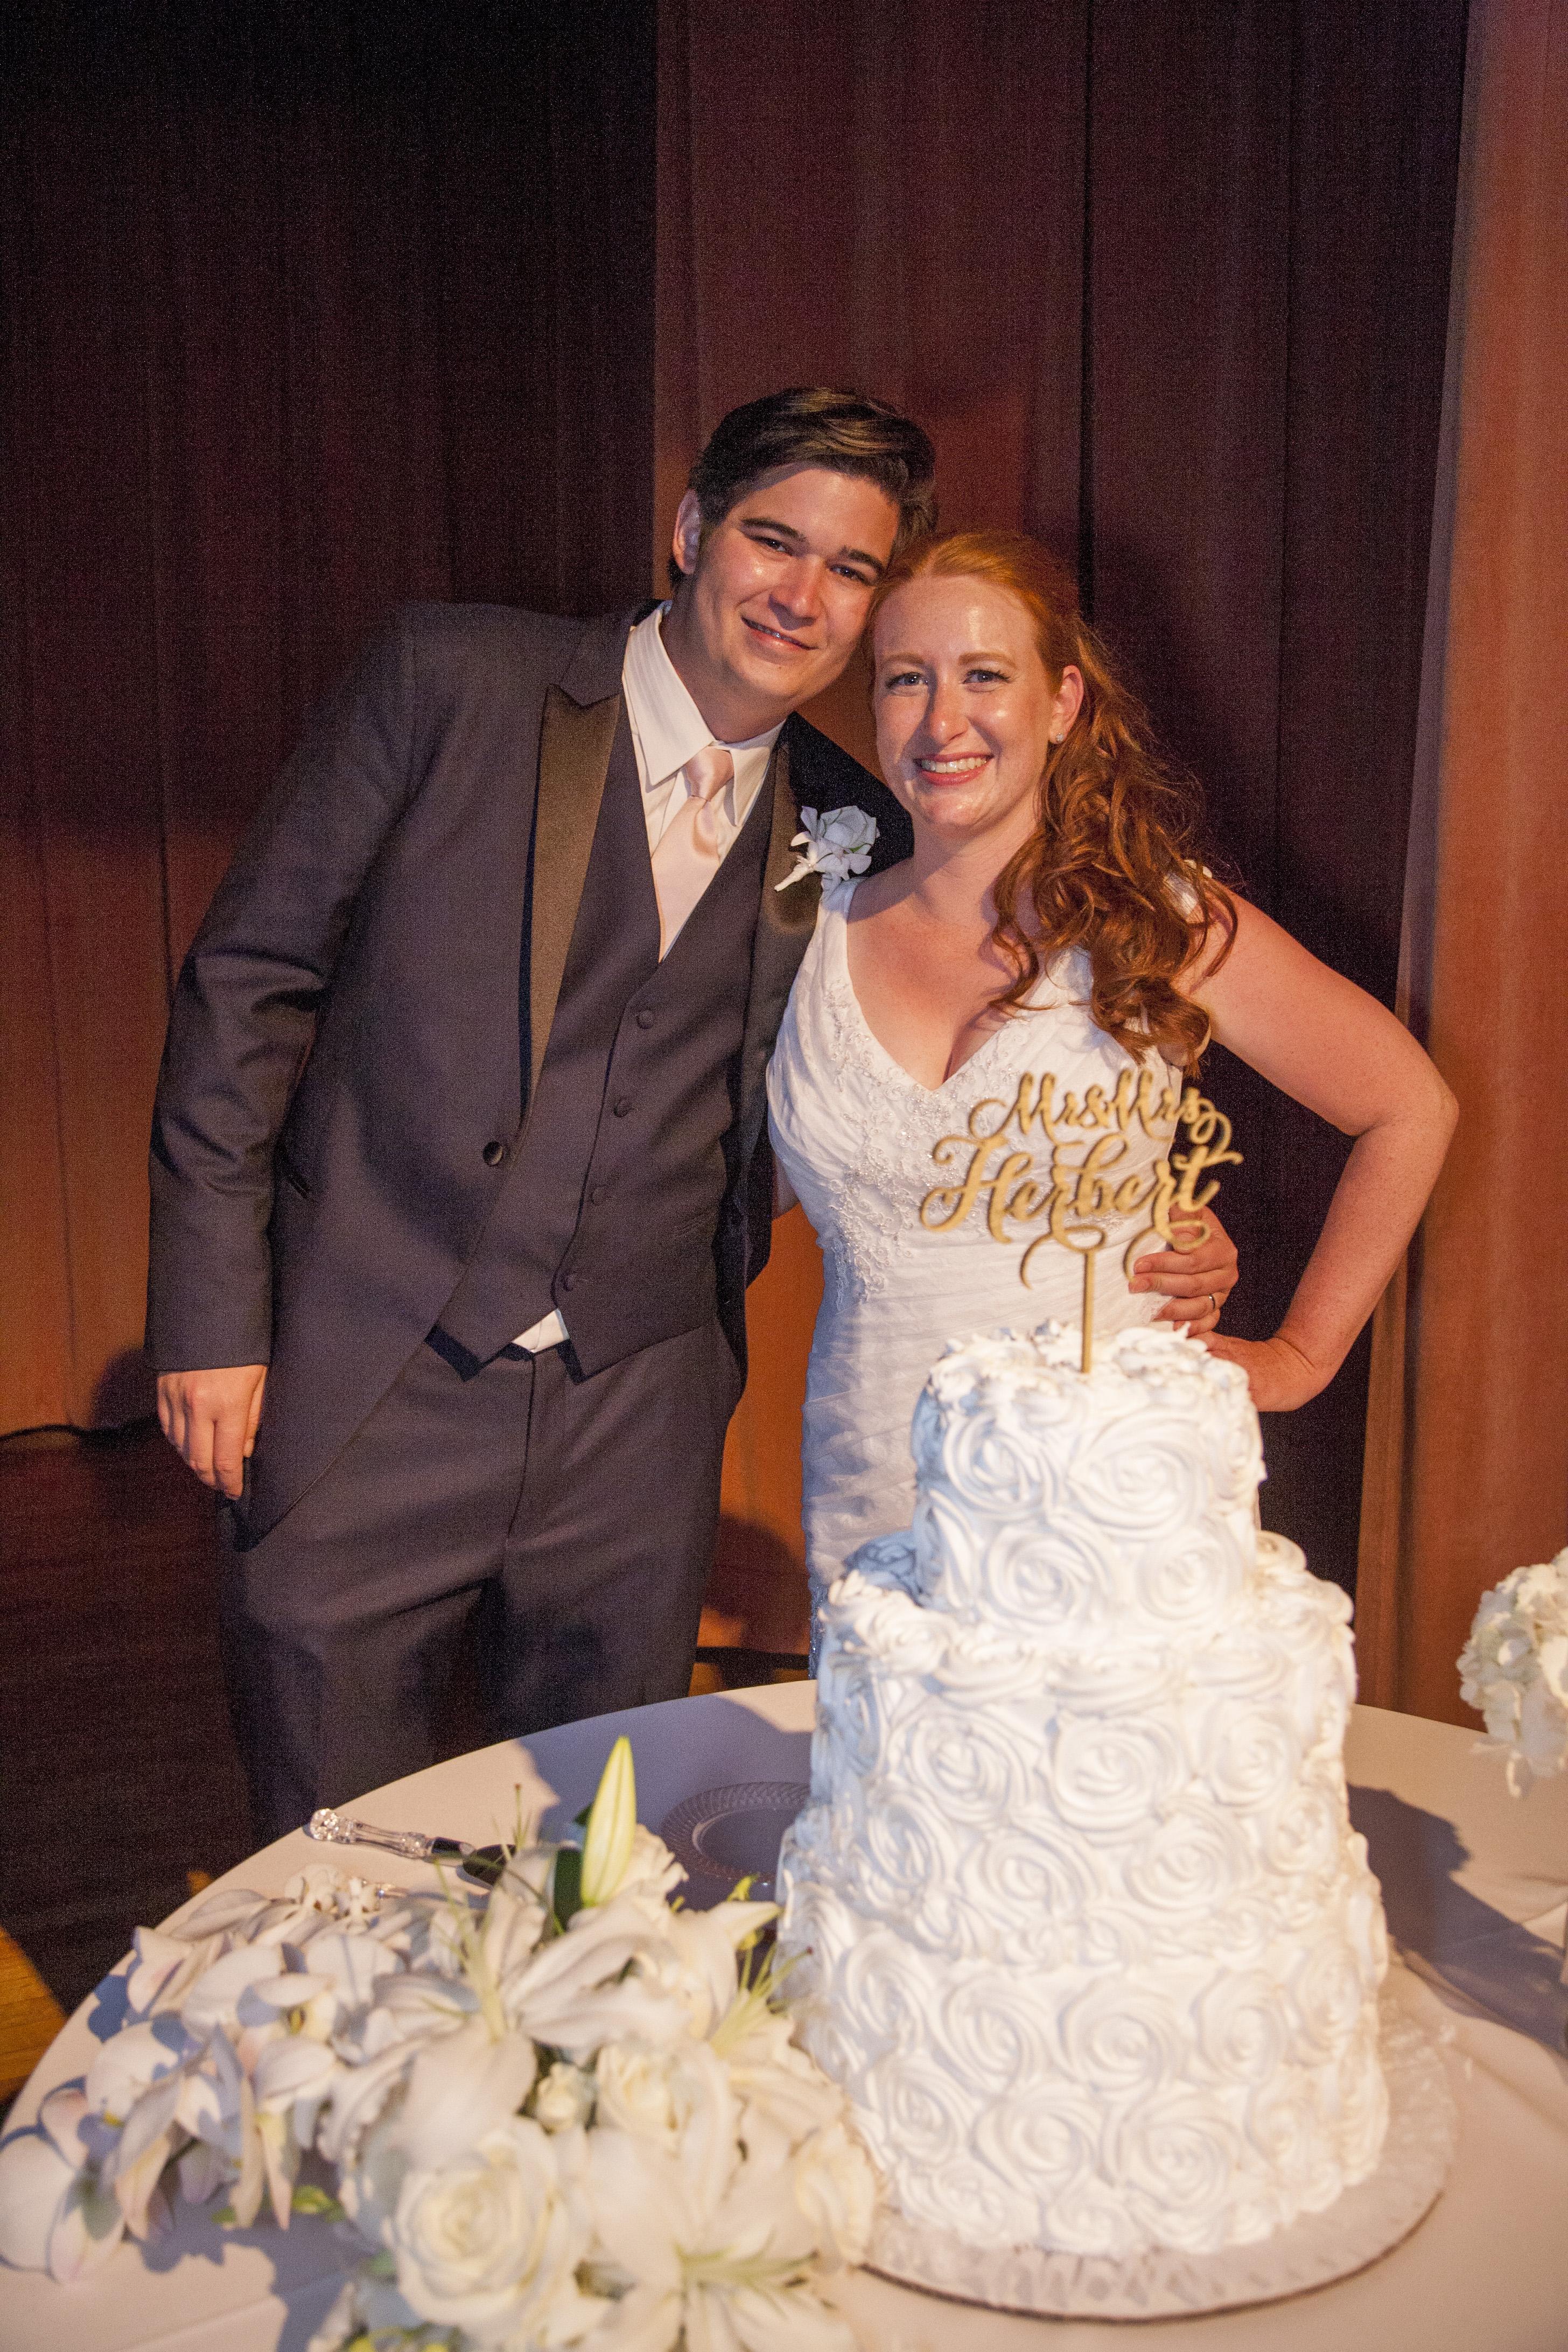 Annemarie and Skylar were lifesavers for my wedding!